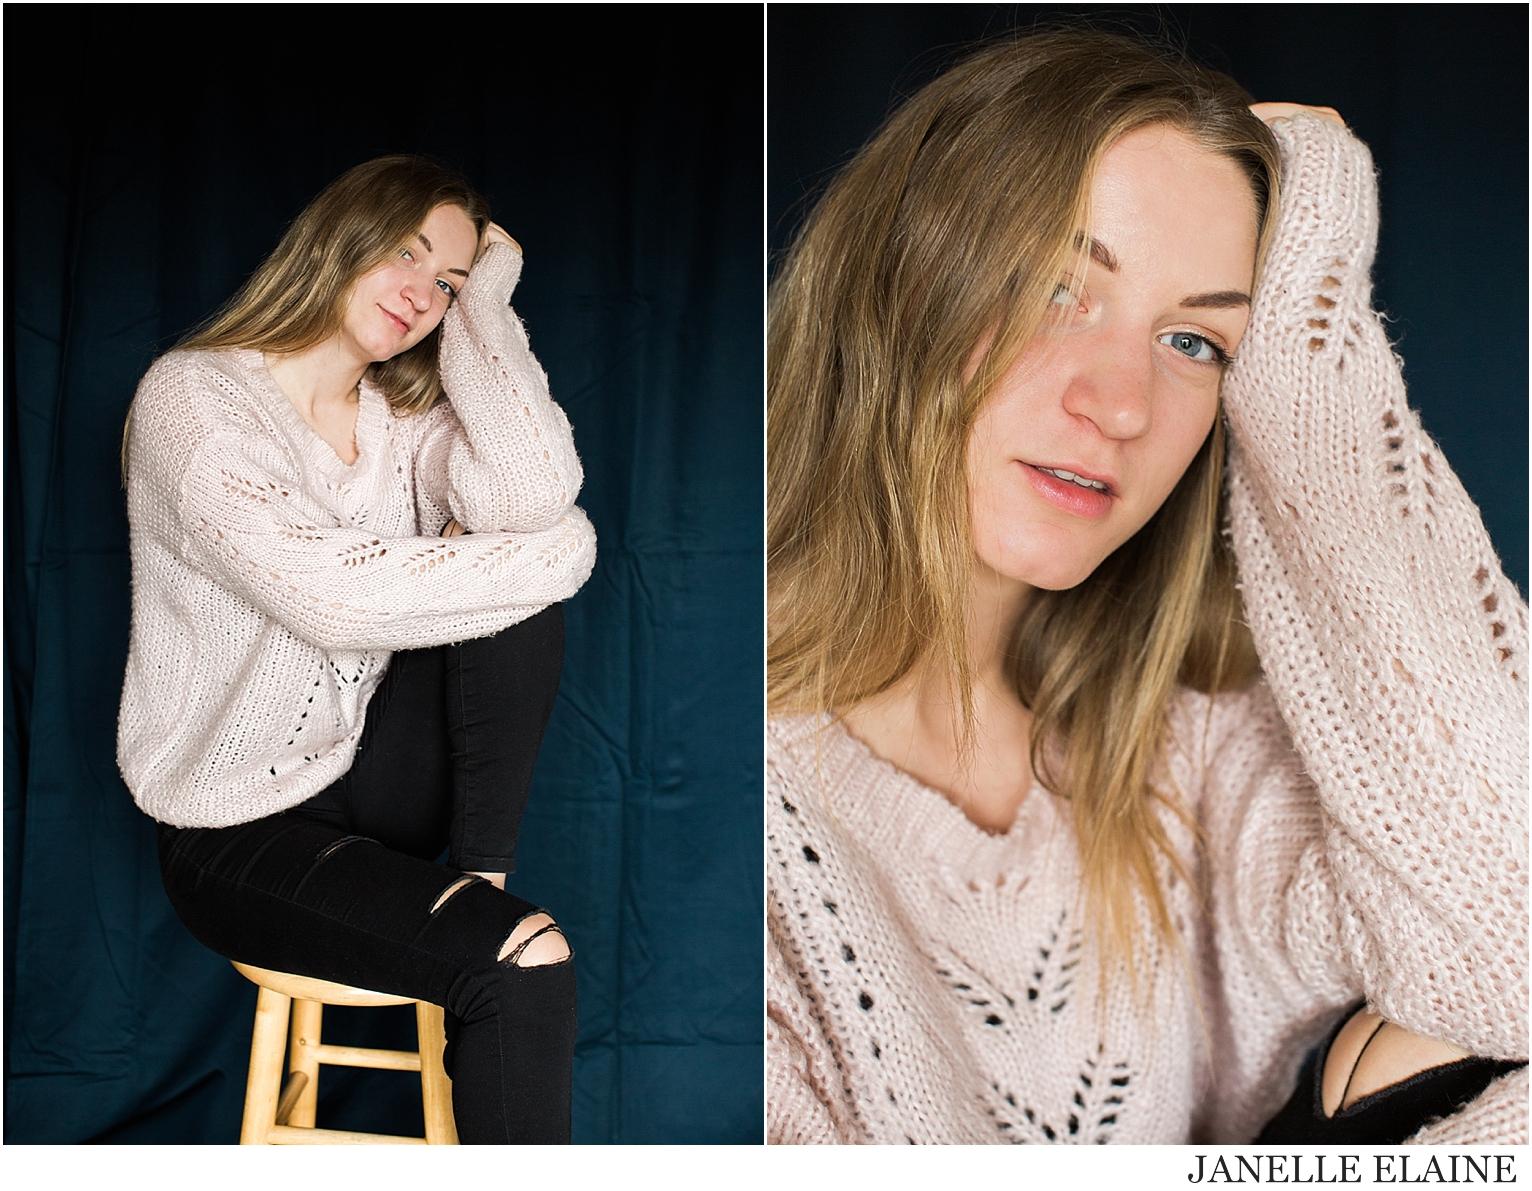 kirsi-seattle-wa-portrait photography-janelle elaine photography-9.jpg